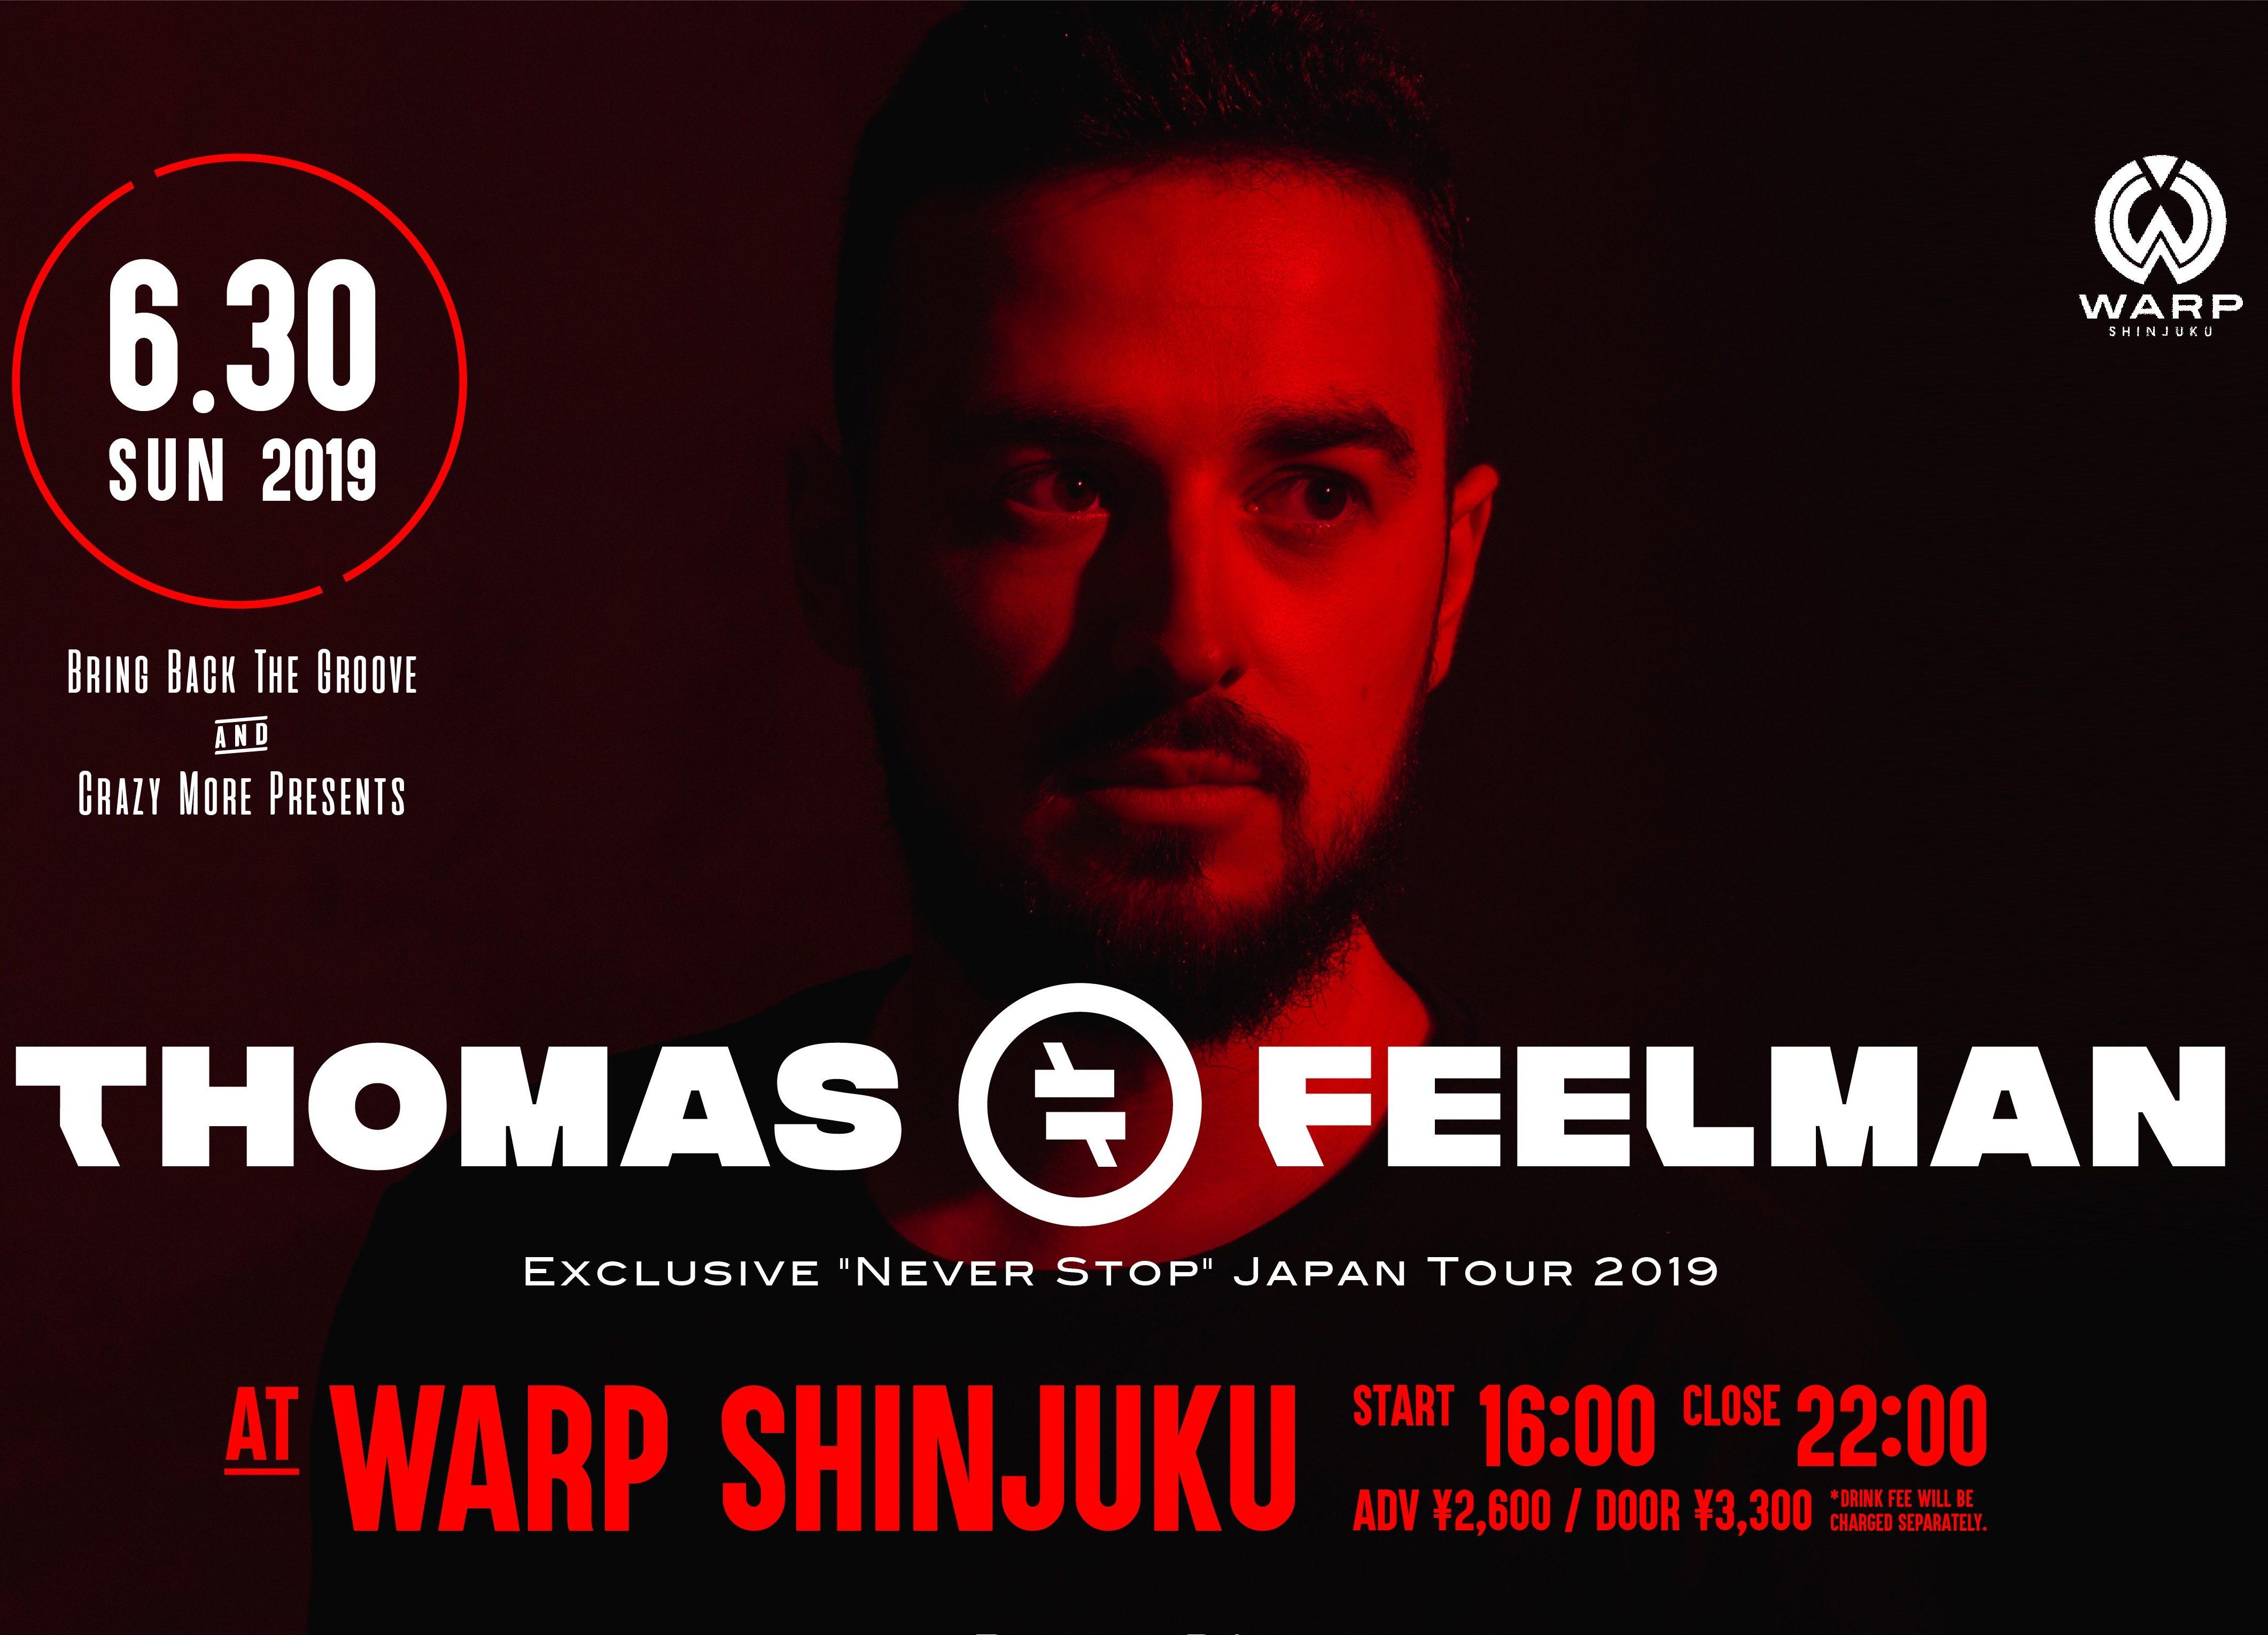 Steve Angelloからも一目置かれているThomas Feelmanのジャパンツアーが決定!